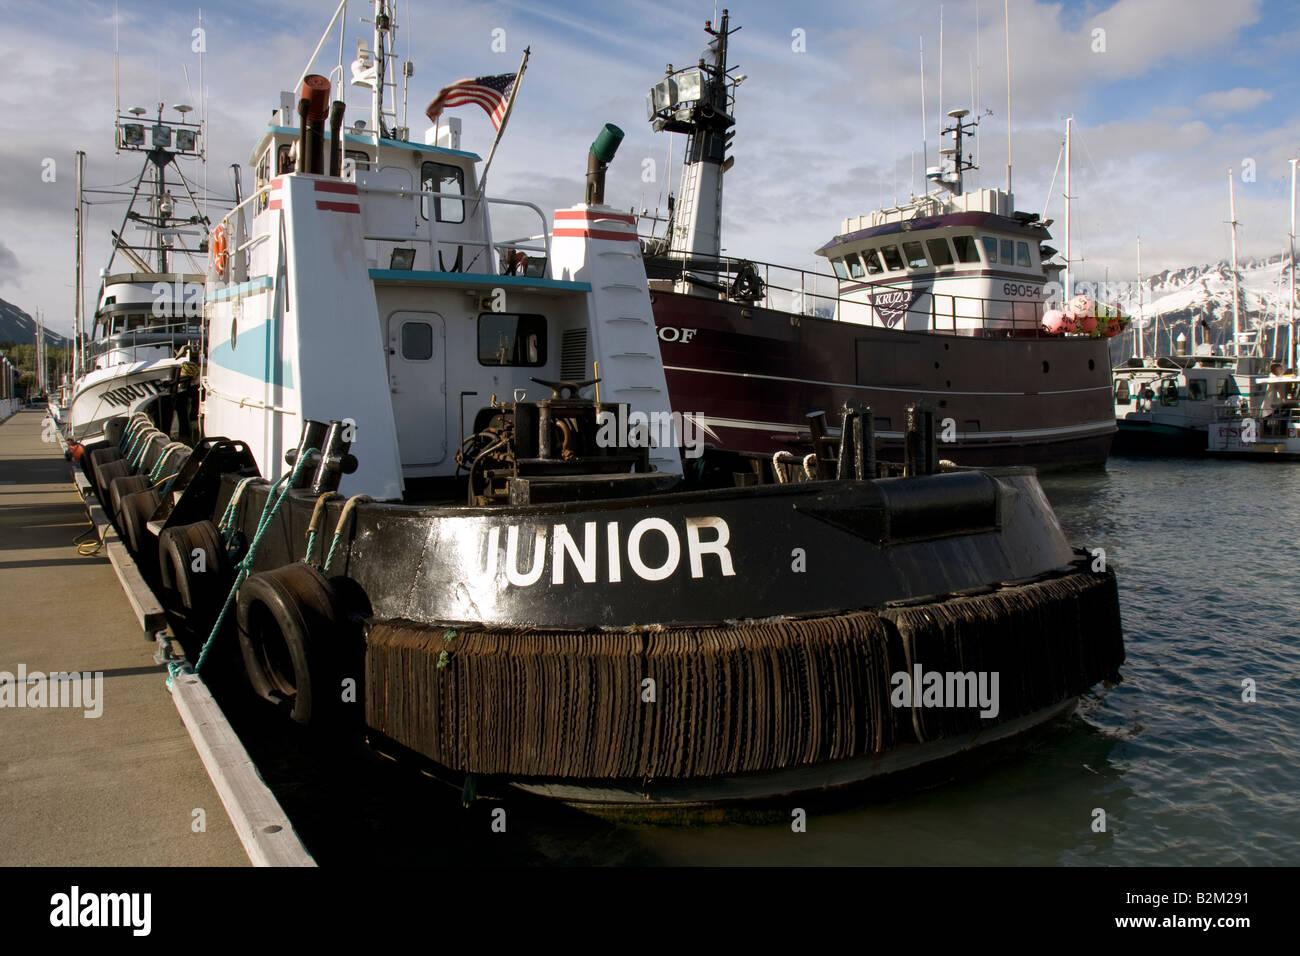 Towboat in Seward Harbour, Alaska - Stock Image